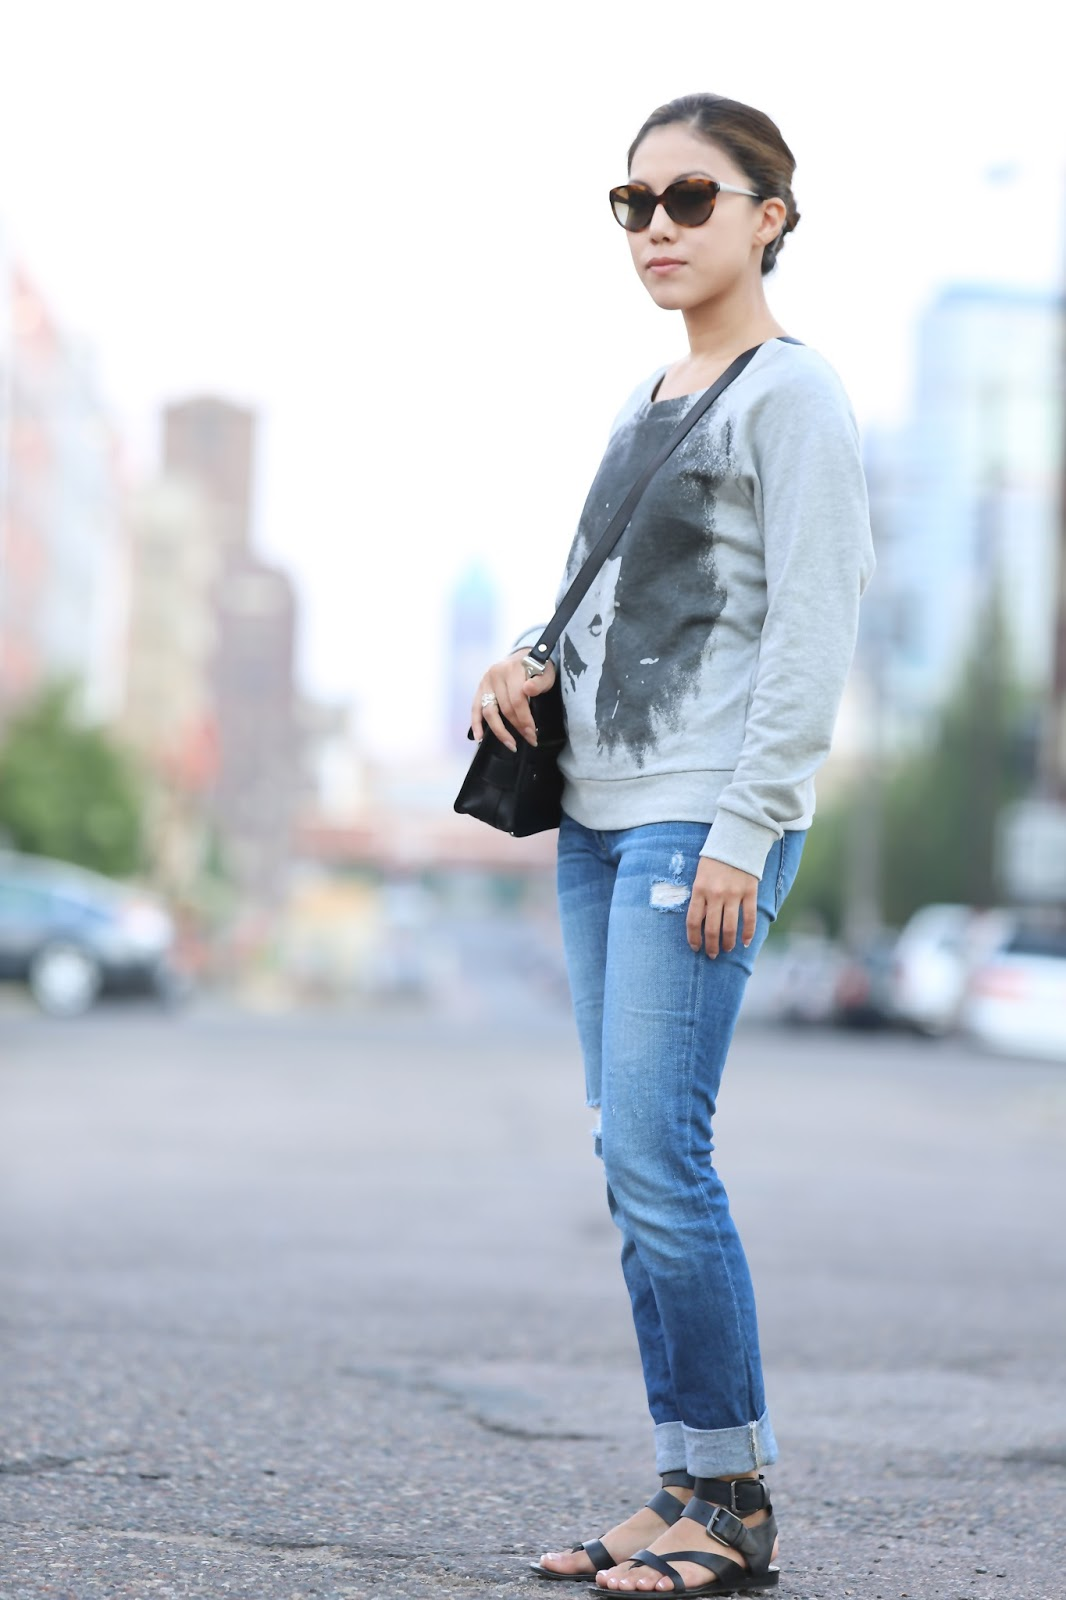 31776c7e78 Haute Hippie sweatshirt (similar here) Proenza Schouler PS11 Franco Sarto  glinda flat sandal. Ralph Lauren sunglasses (similar here)